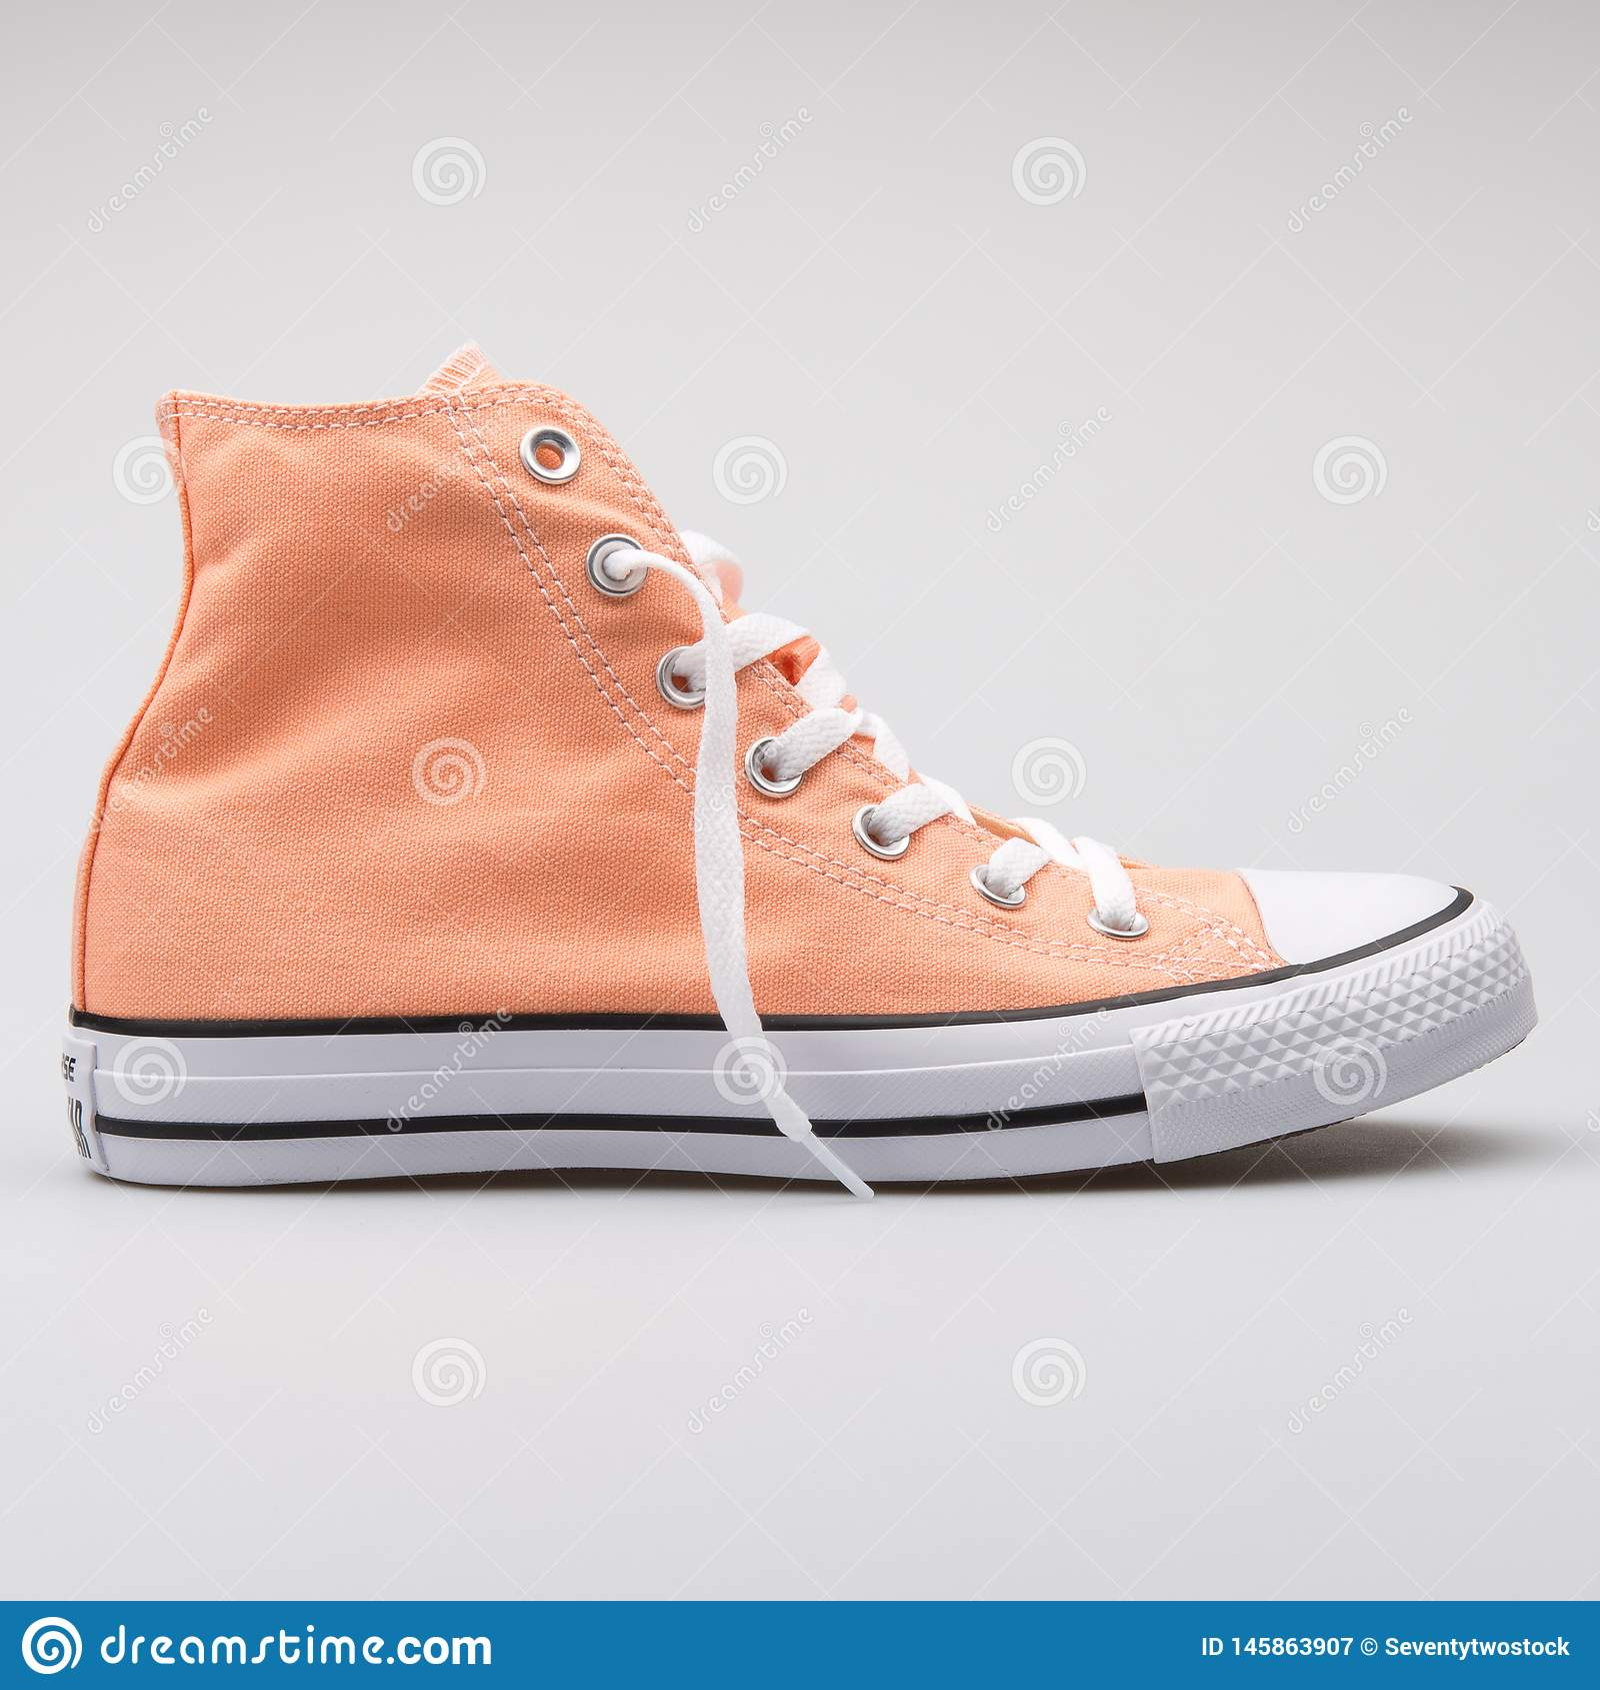 Converse Chuck Taylor All Star High Peach Sneaker Editorial